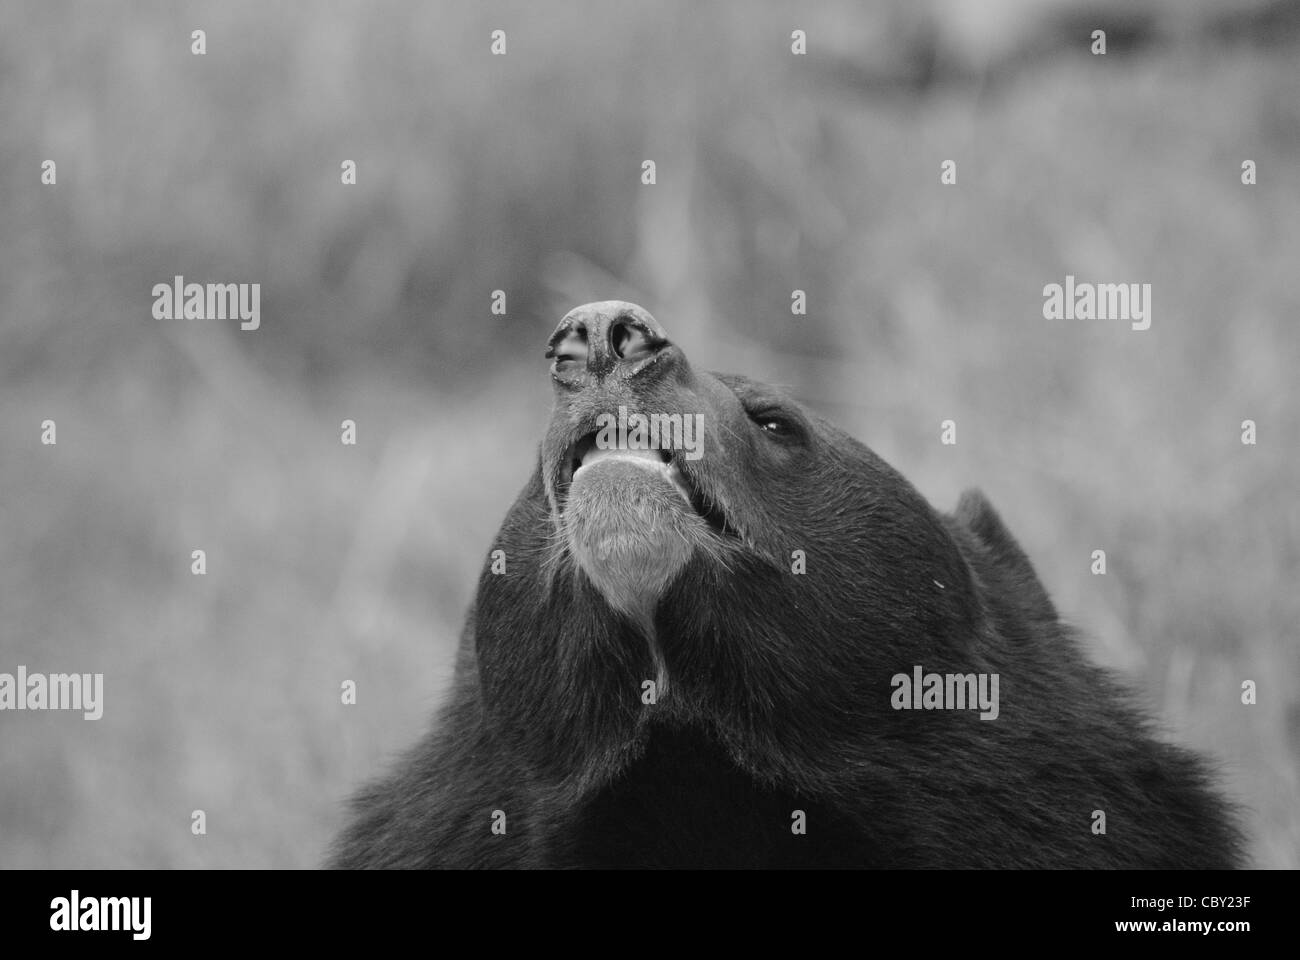 Himalayan black bear, (Ursus thibetanus). - Stock Image